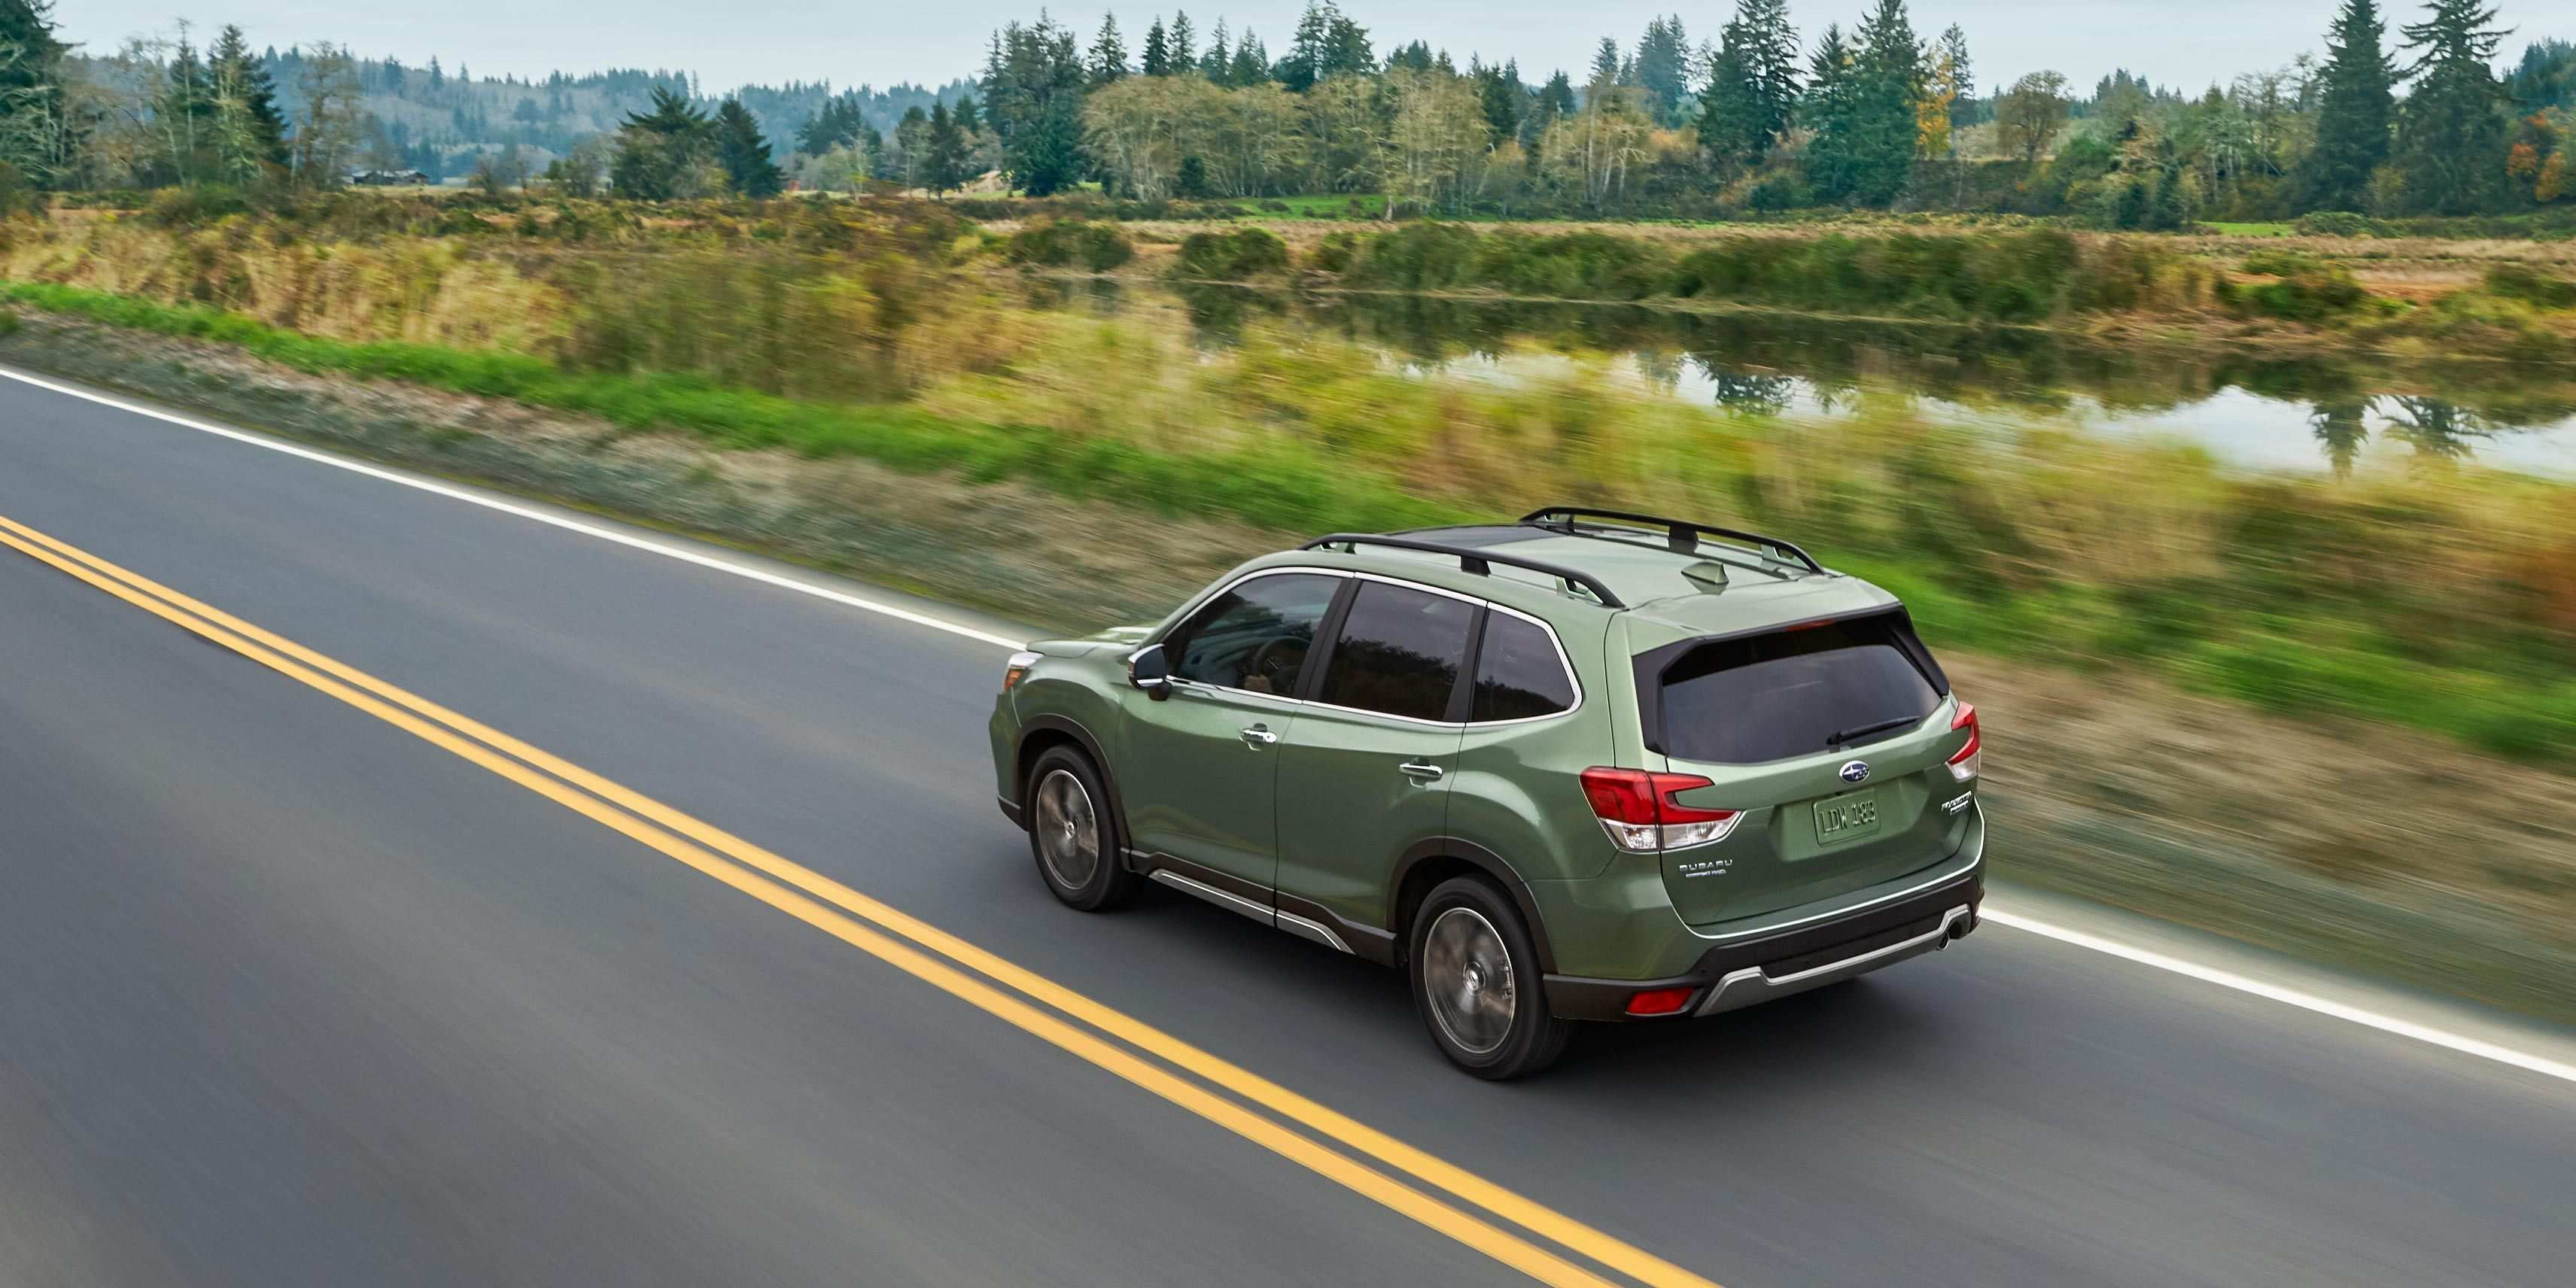 41 The Subaru Forester 2019 Green Spy Shoot Exterior for Subaru Forester 2019 Green Spy Shoot